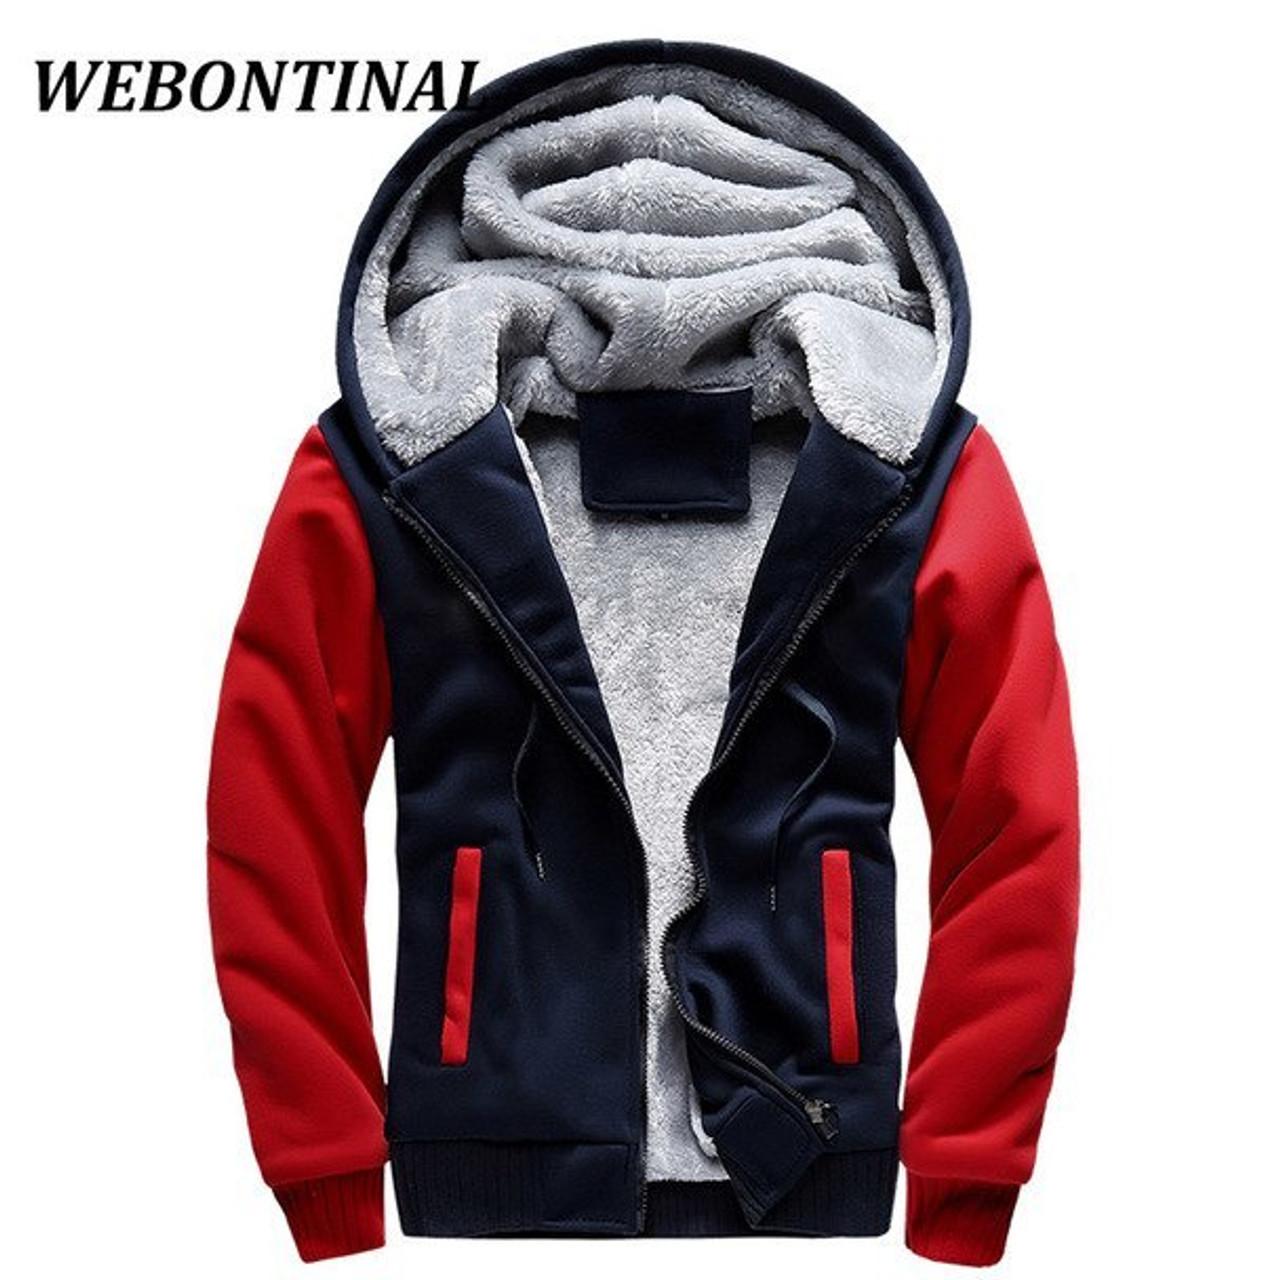 45767929bcb Fashion - Men s Fashion - Men s Clothing - Men s Jacket s - Hoodies ...